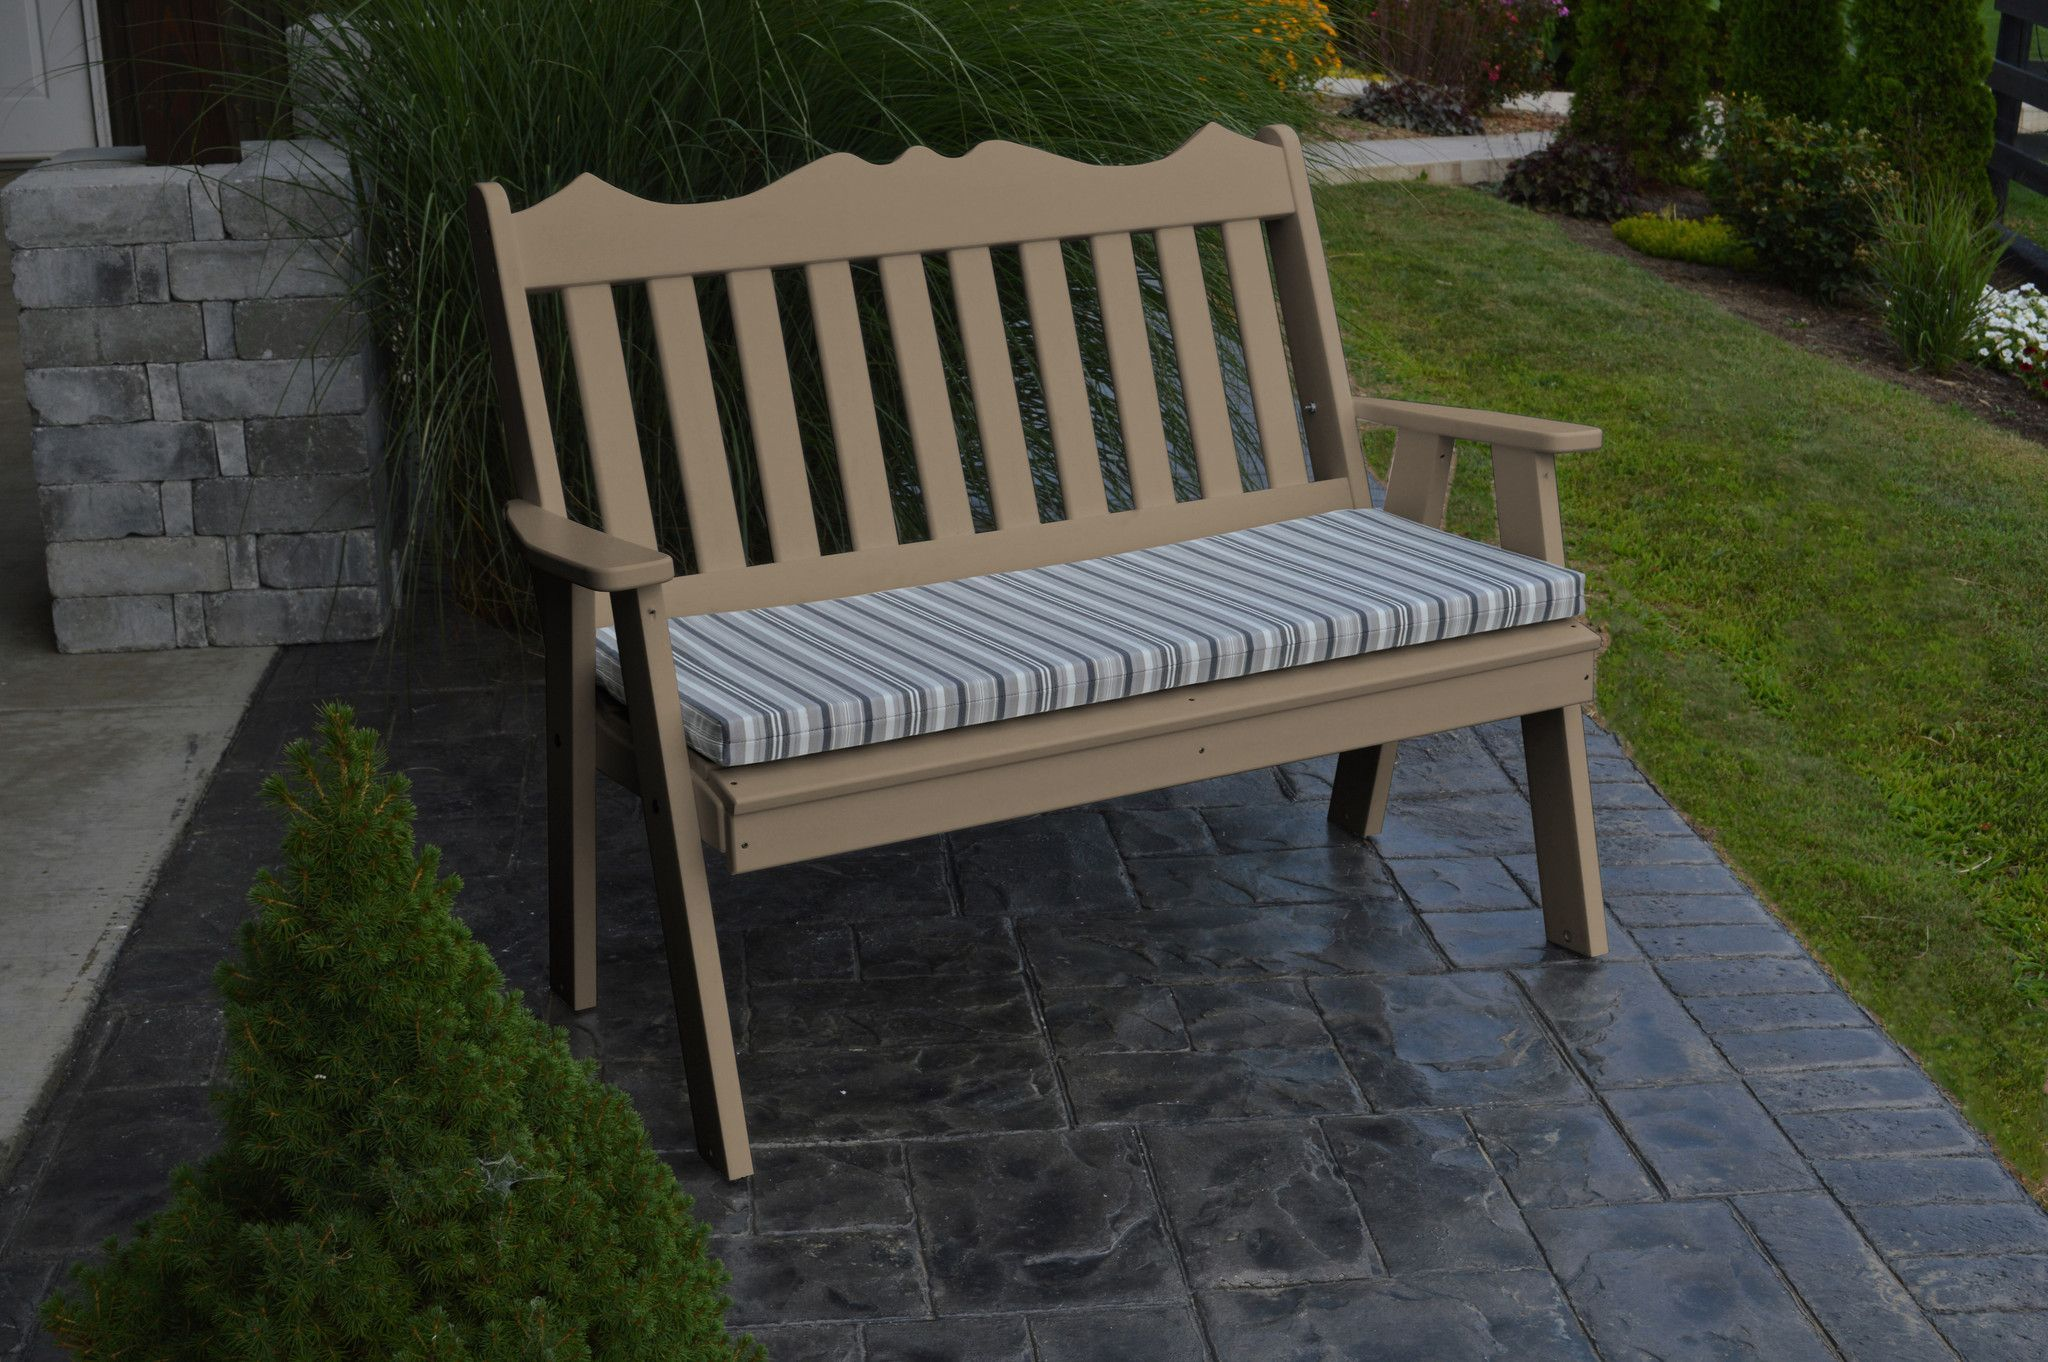 Au0026L Furniture Company Recycled Plastic 4u0027 Royal English Garden Bench